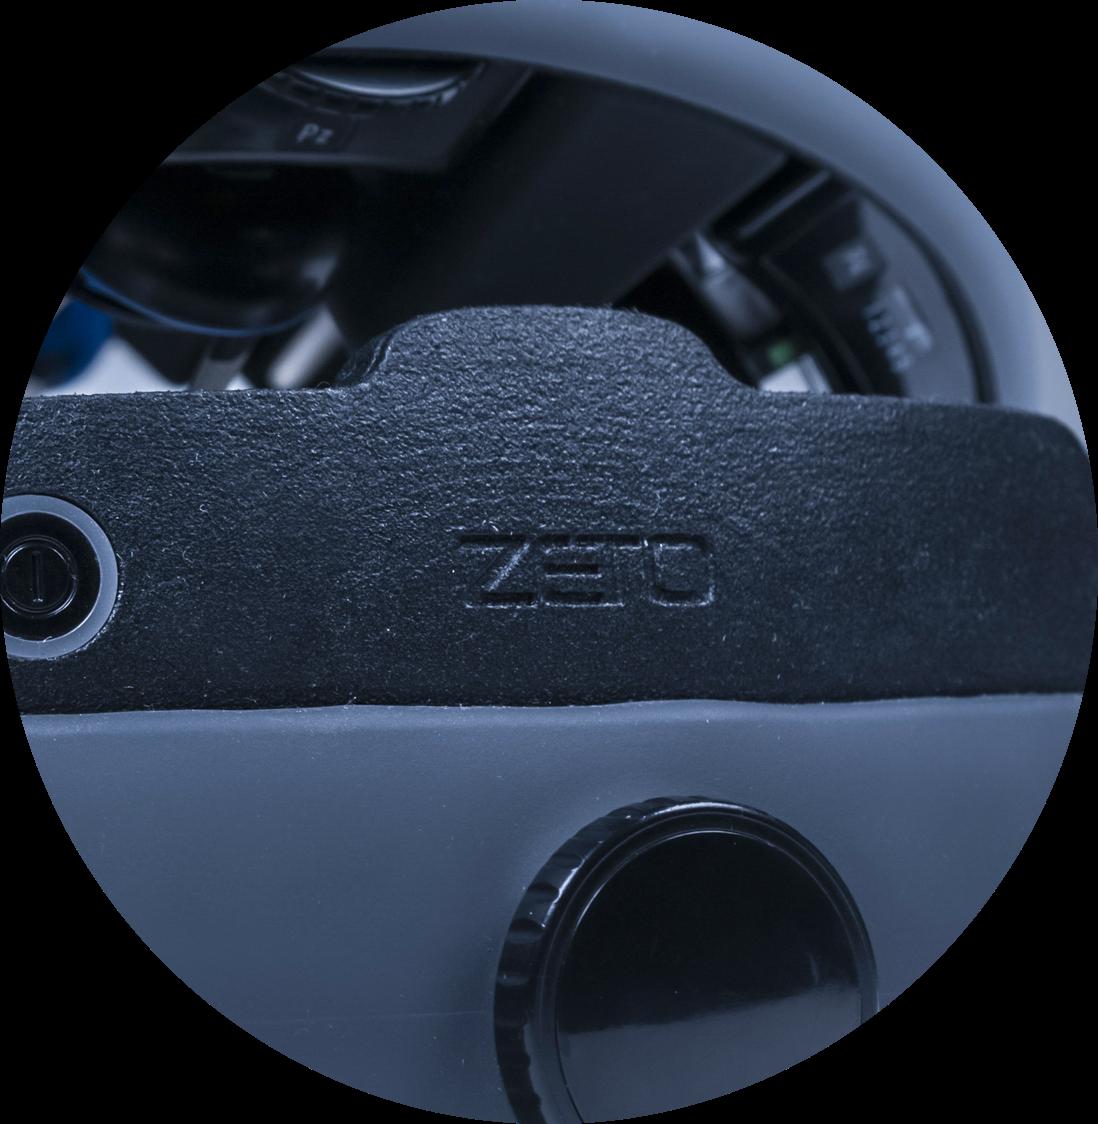 High-Resolution Digital Signal | Zeto Dry EEG Headset Component